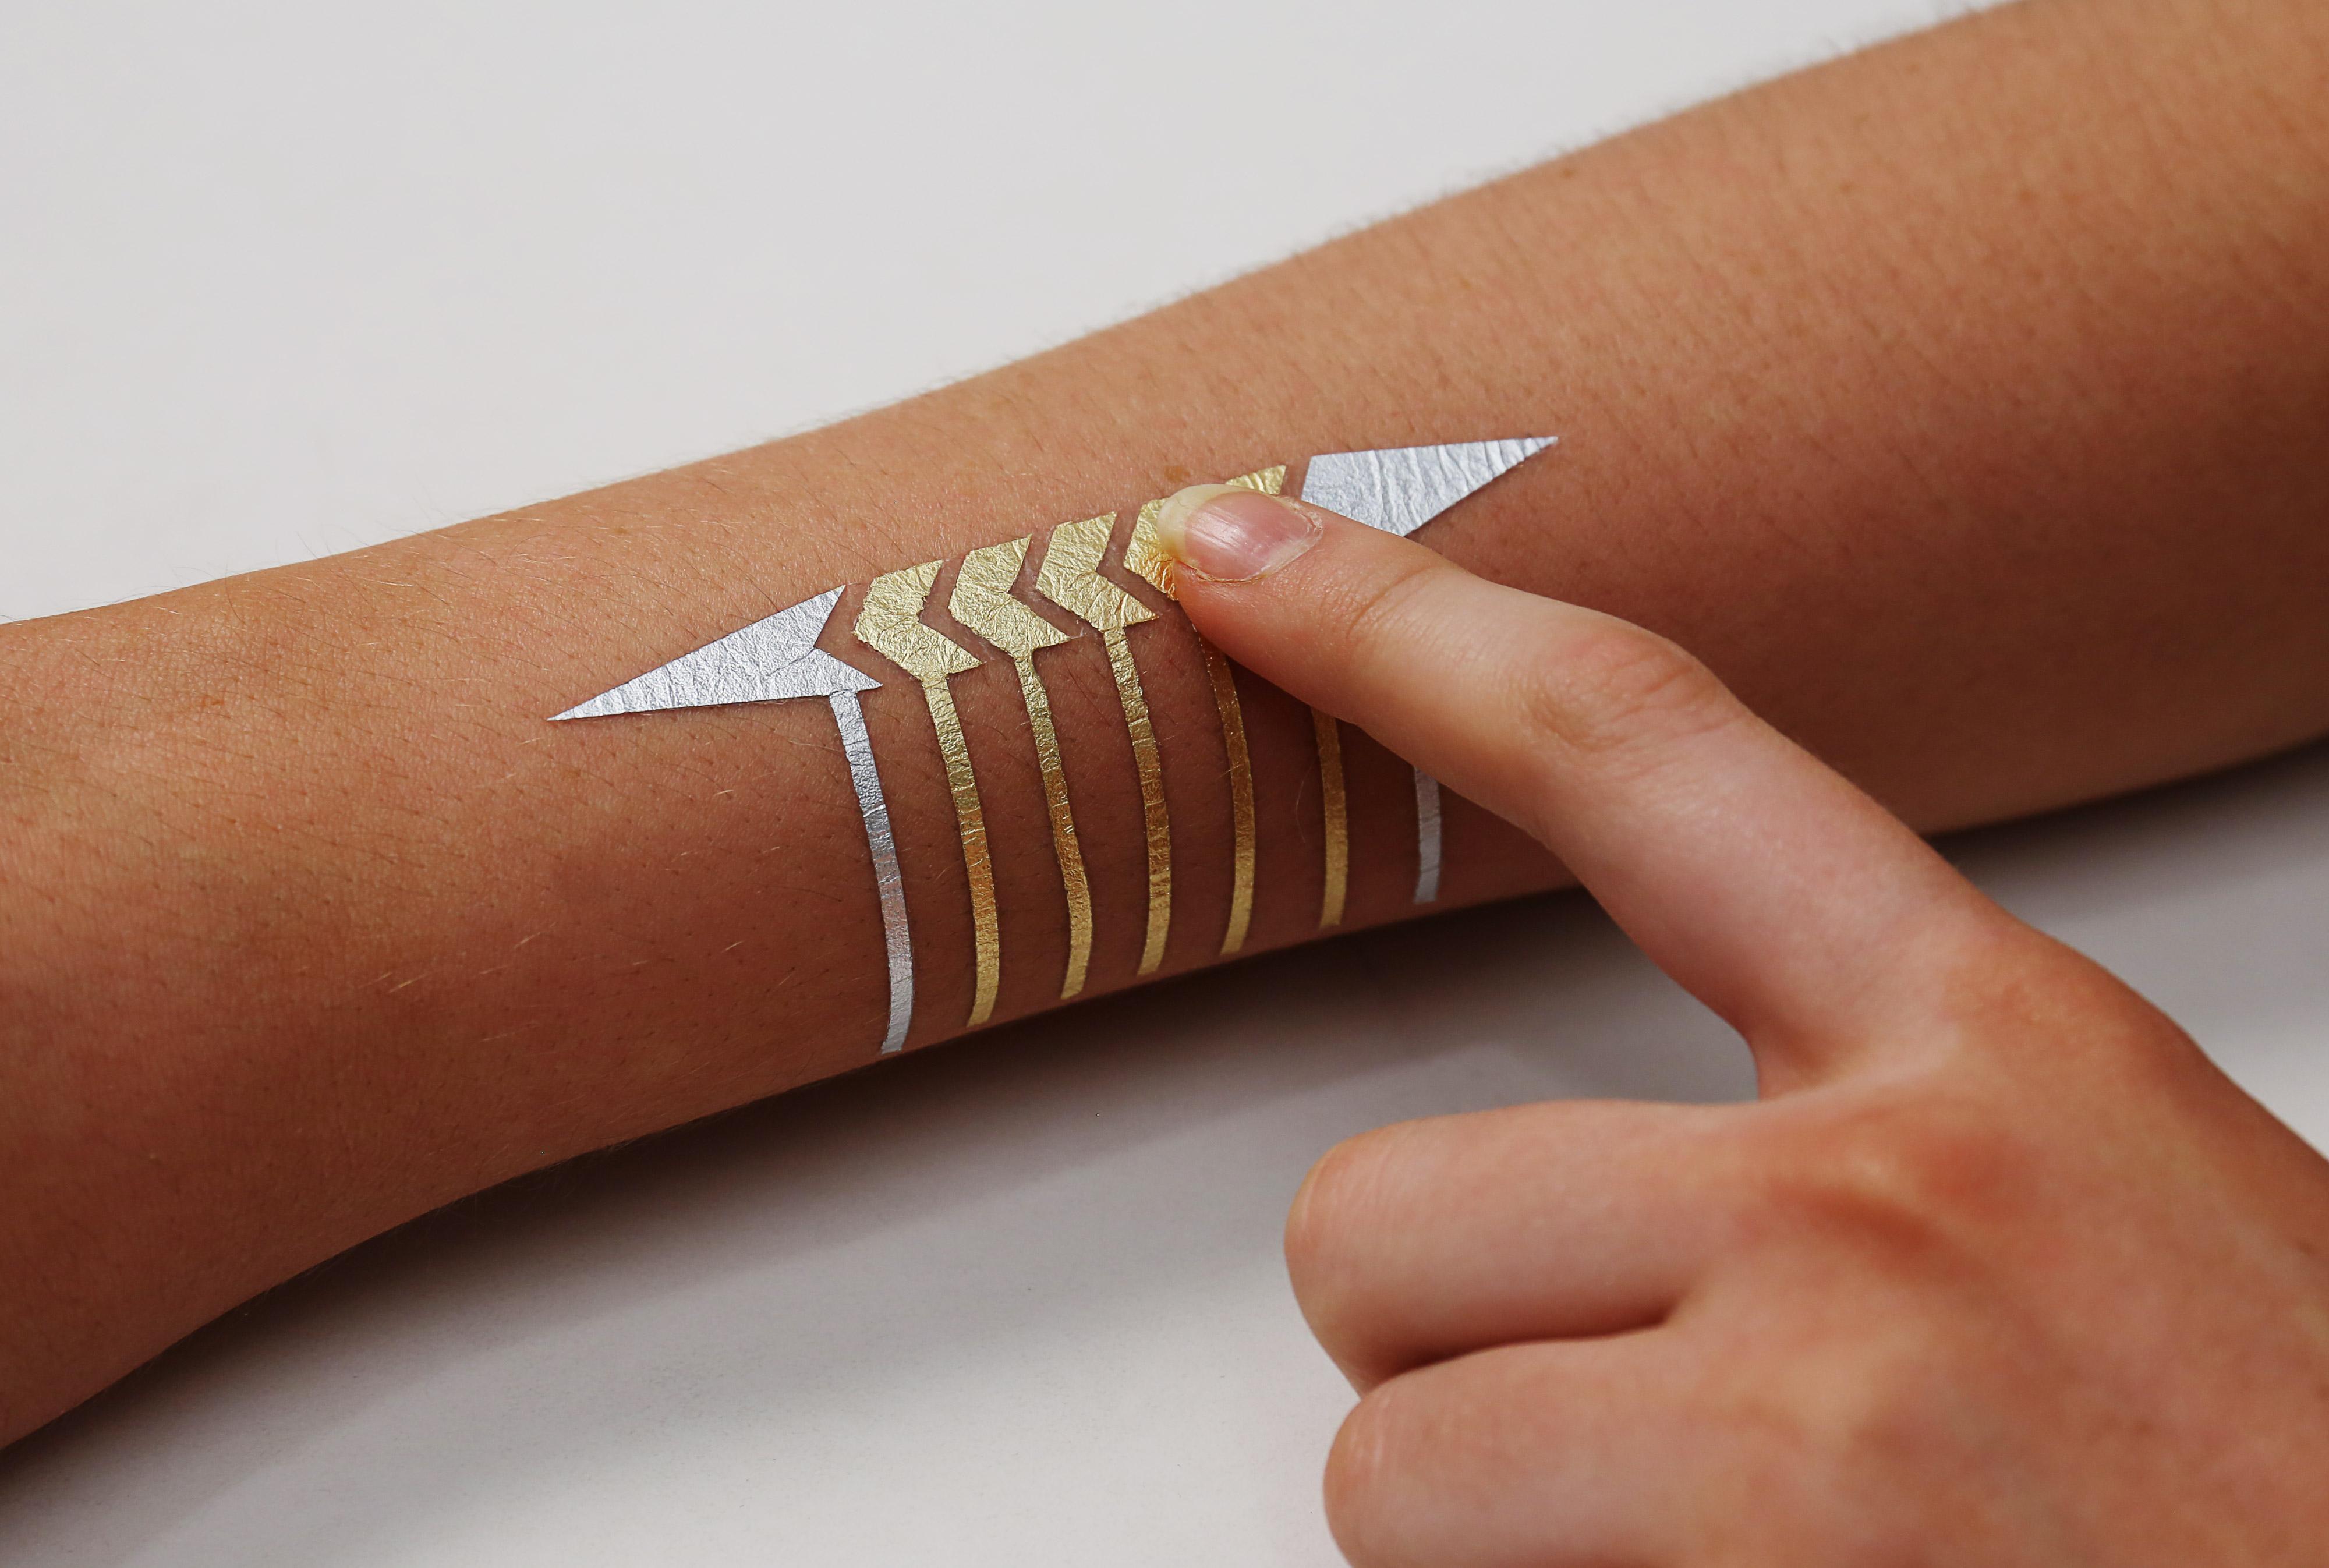 Tatuaggio intelligente sblocco dispositivo